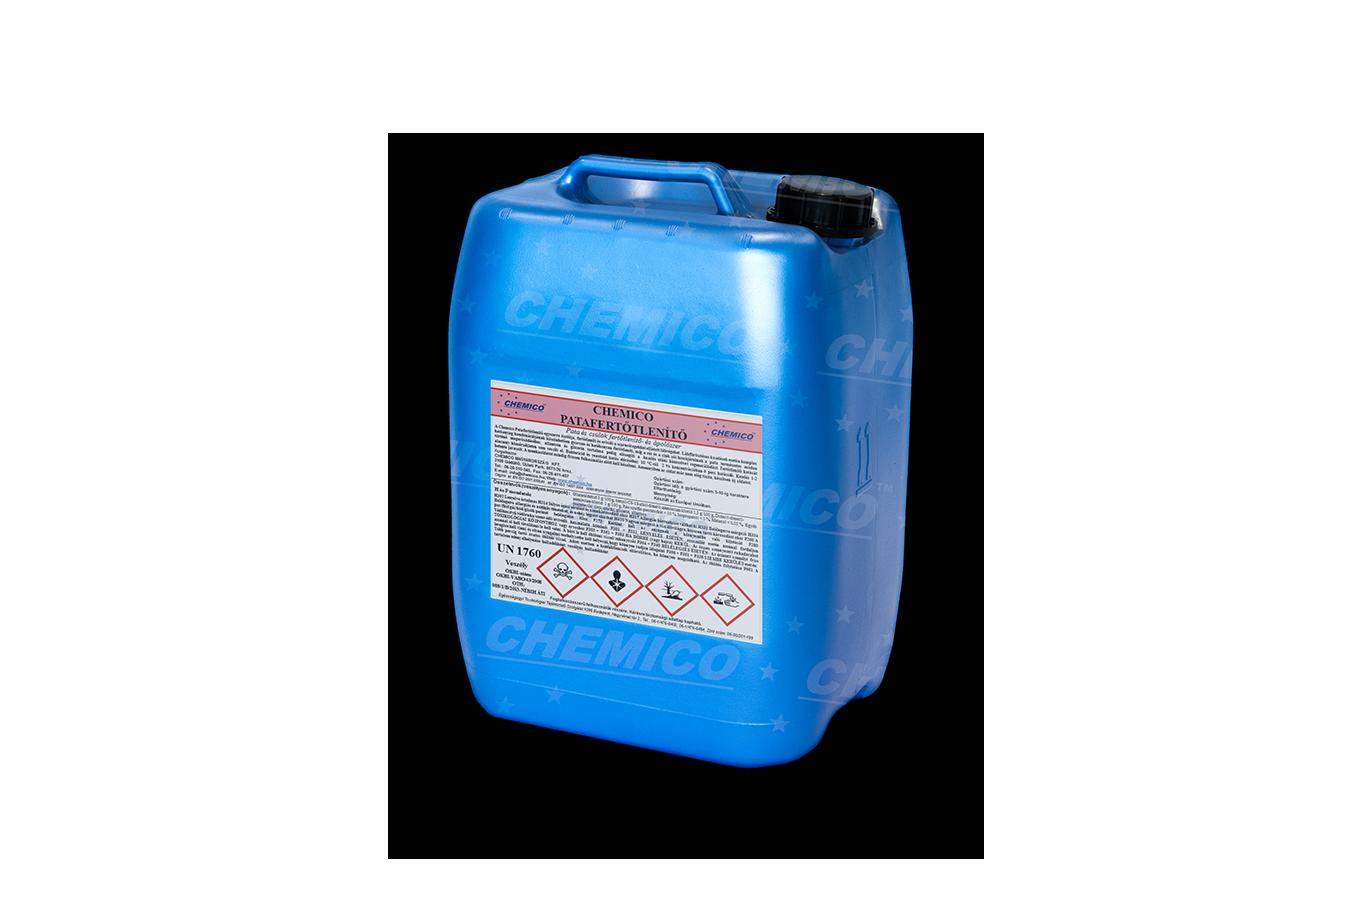 chemico-patafertotlenito-szer-ipari-csulok-fertotlenito-apolo-allattenyesztes-baktericid-20l